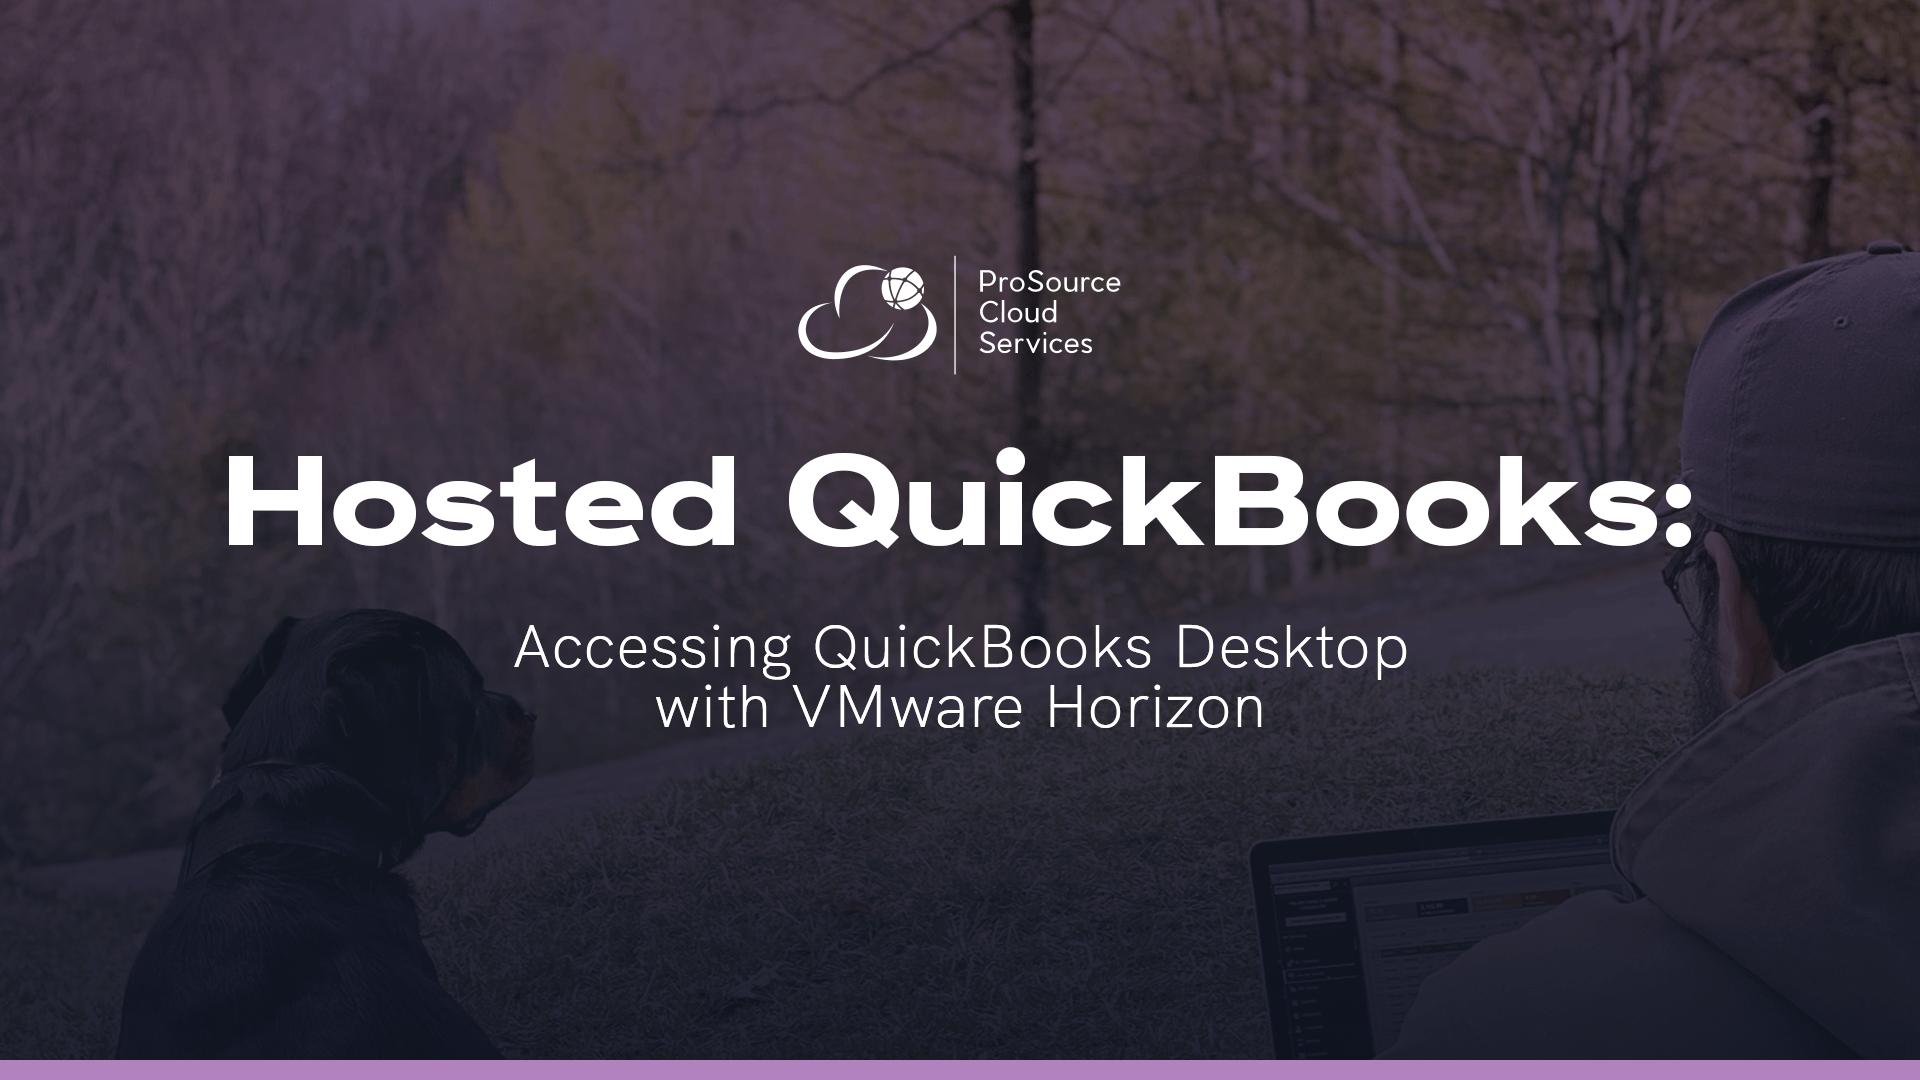 Hosted QuickBooks Accessing QuickBooks Desktop with VMware Horizon